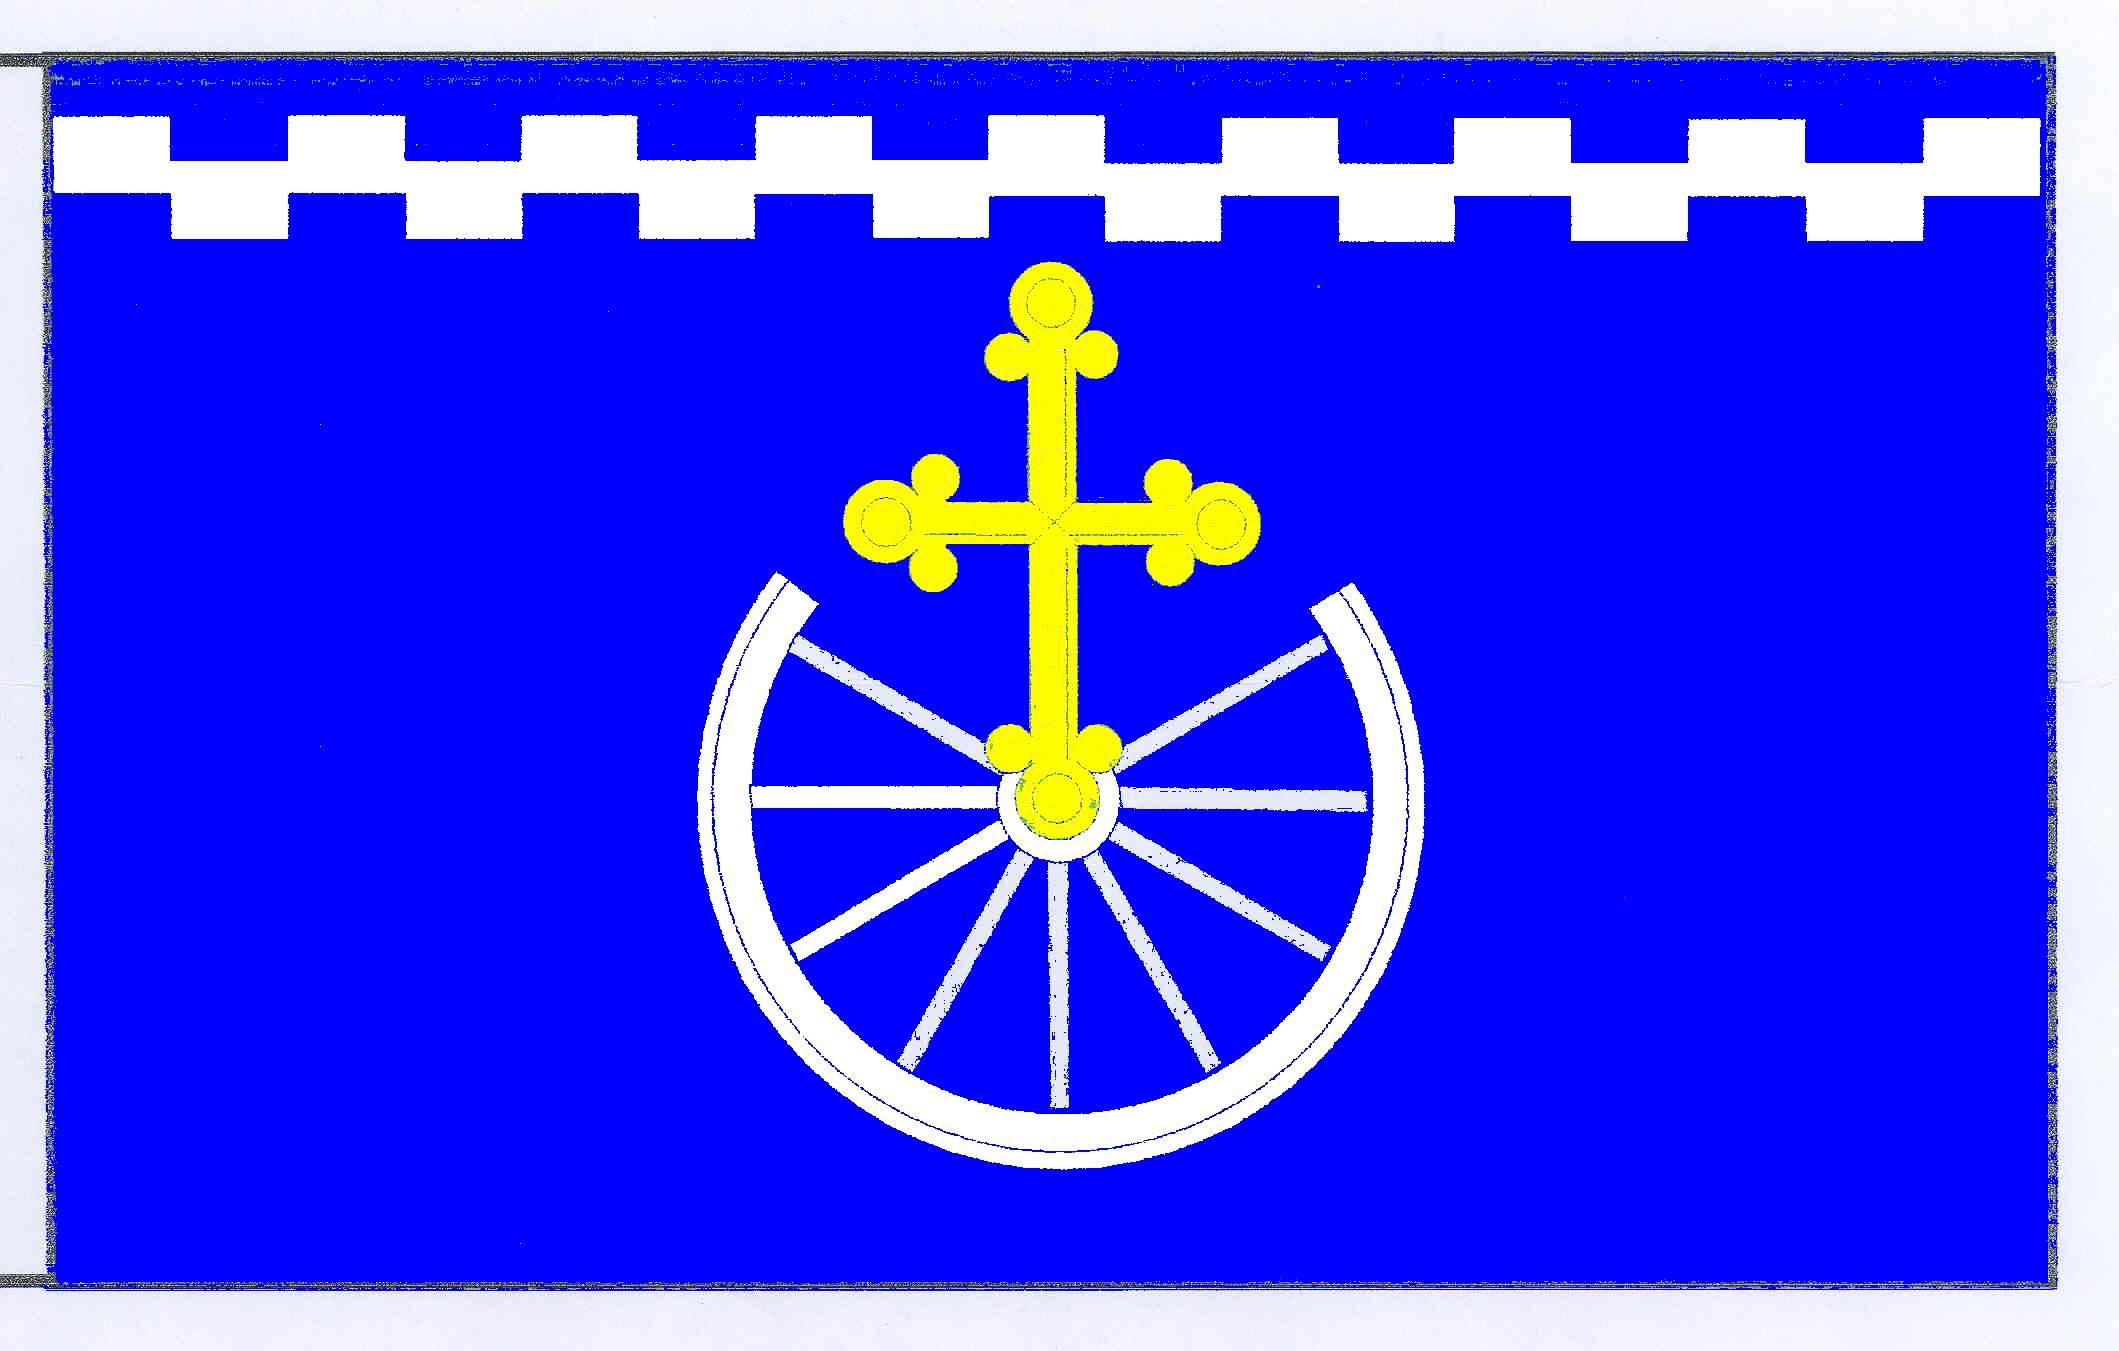 Flagge GemeindeKirchbarkau, Kreis Plön